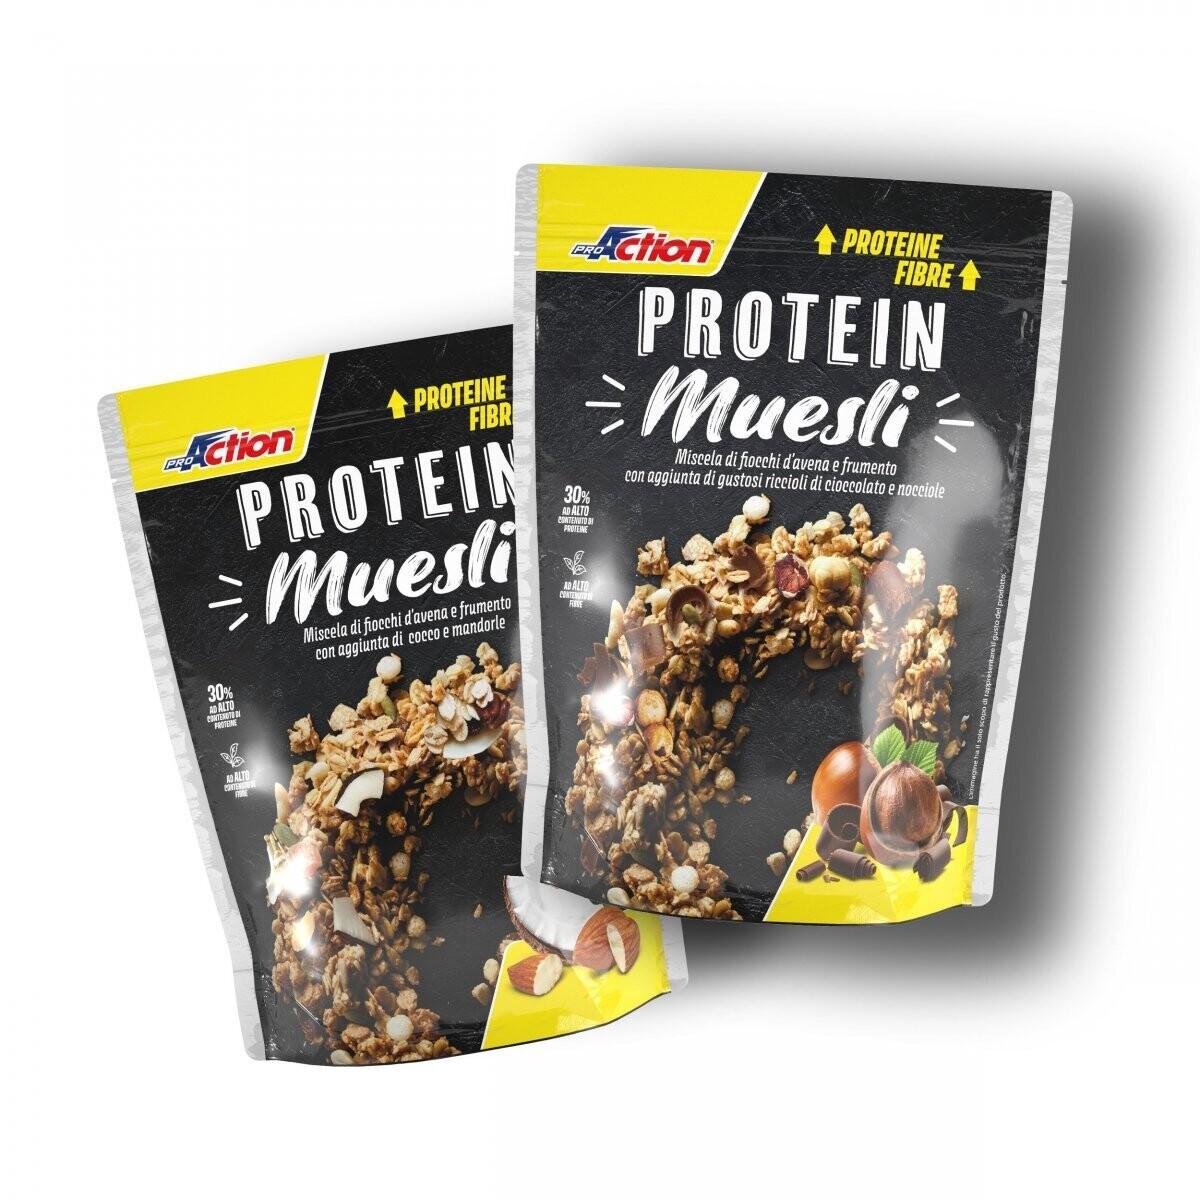 Protein Muesli